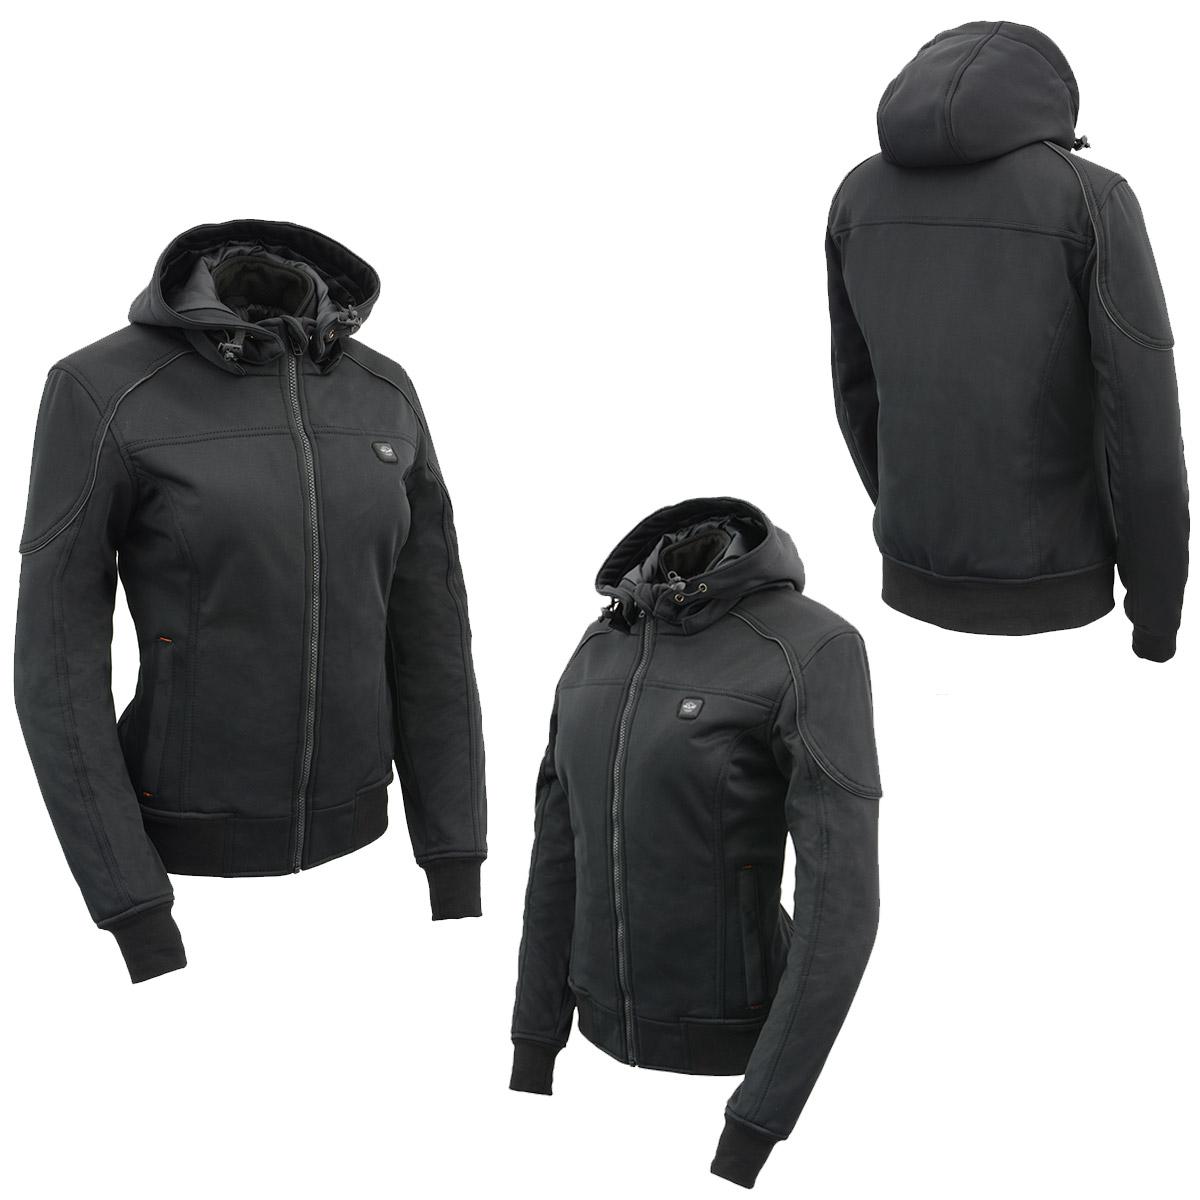 Detachable Hood /& Battery Pack Milwaukee Performance Men/'s Jacket Soft Shell